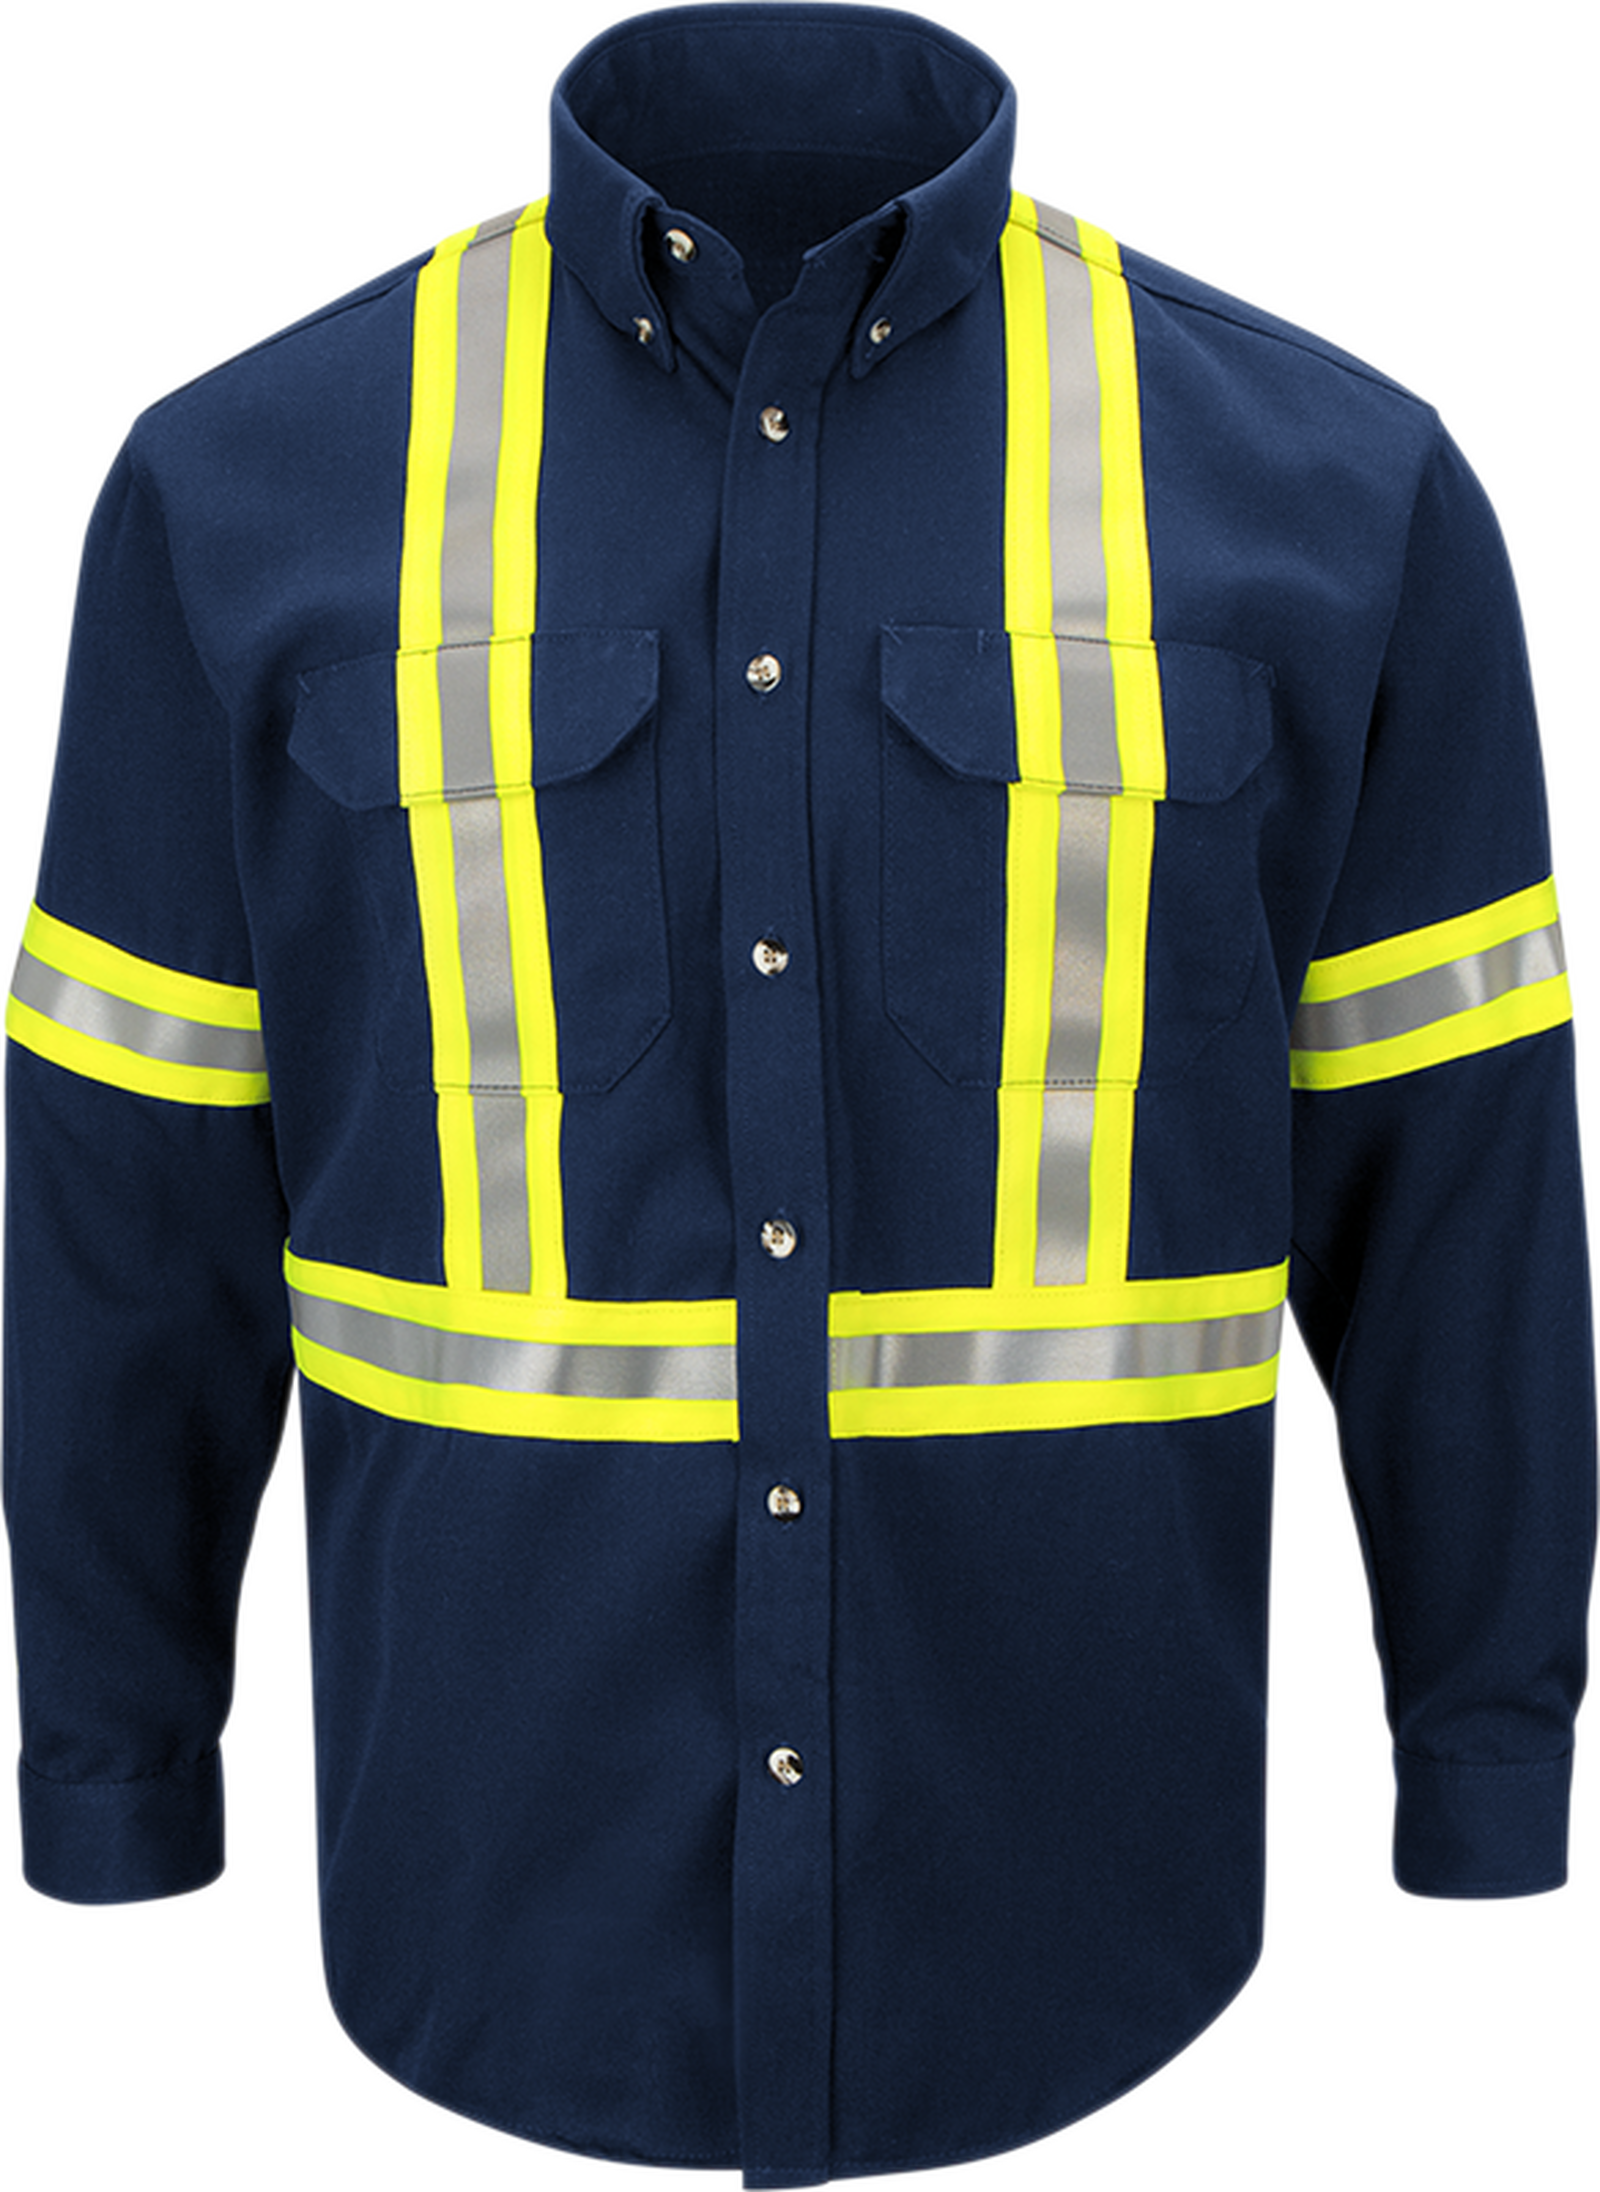 Men's Midweight FR Enhanced Visibility Uniform Shirt with Reflective Trim